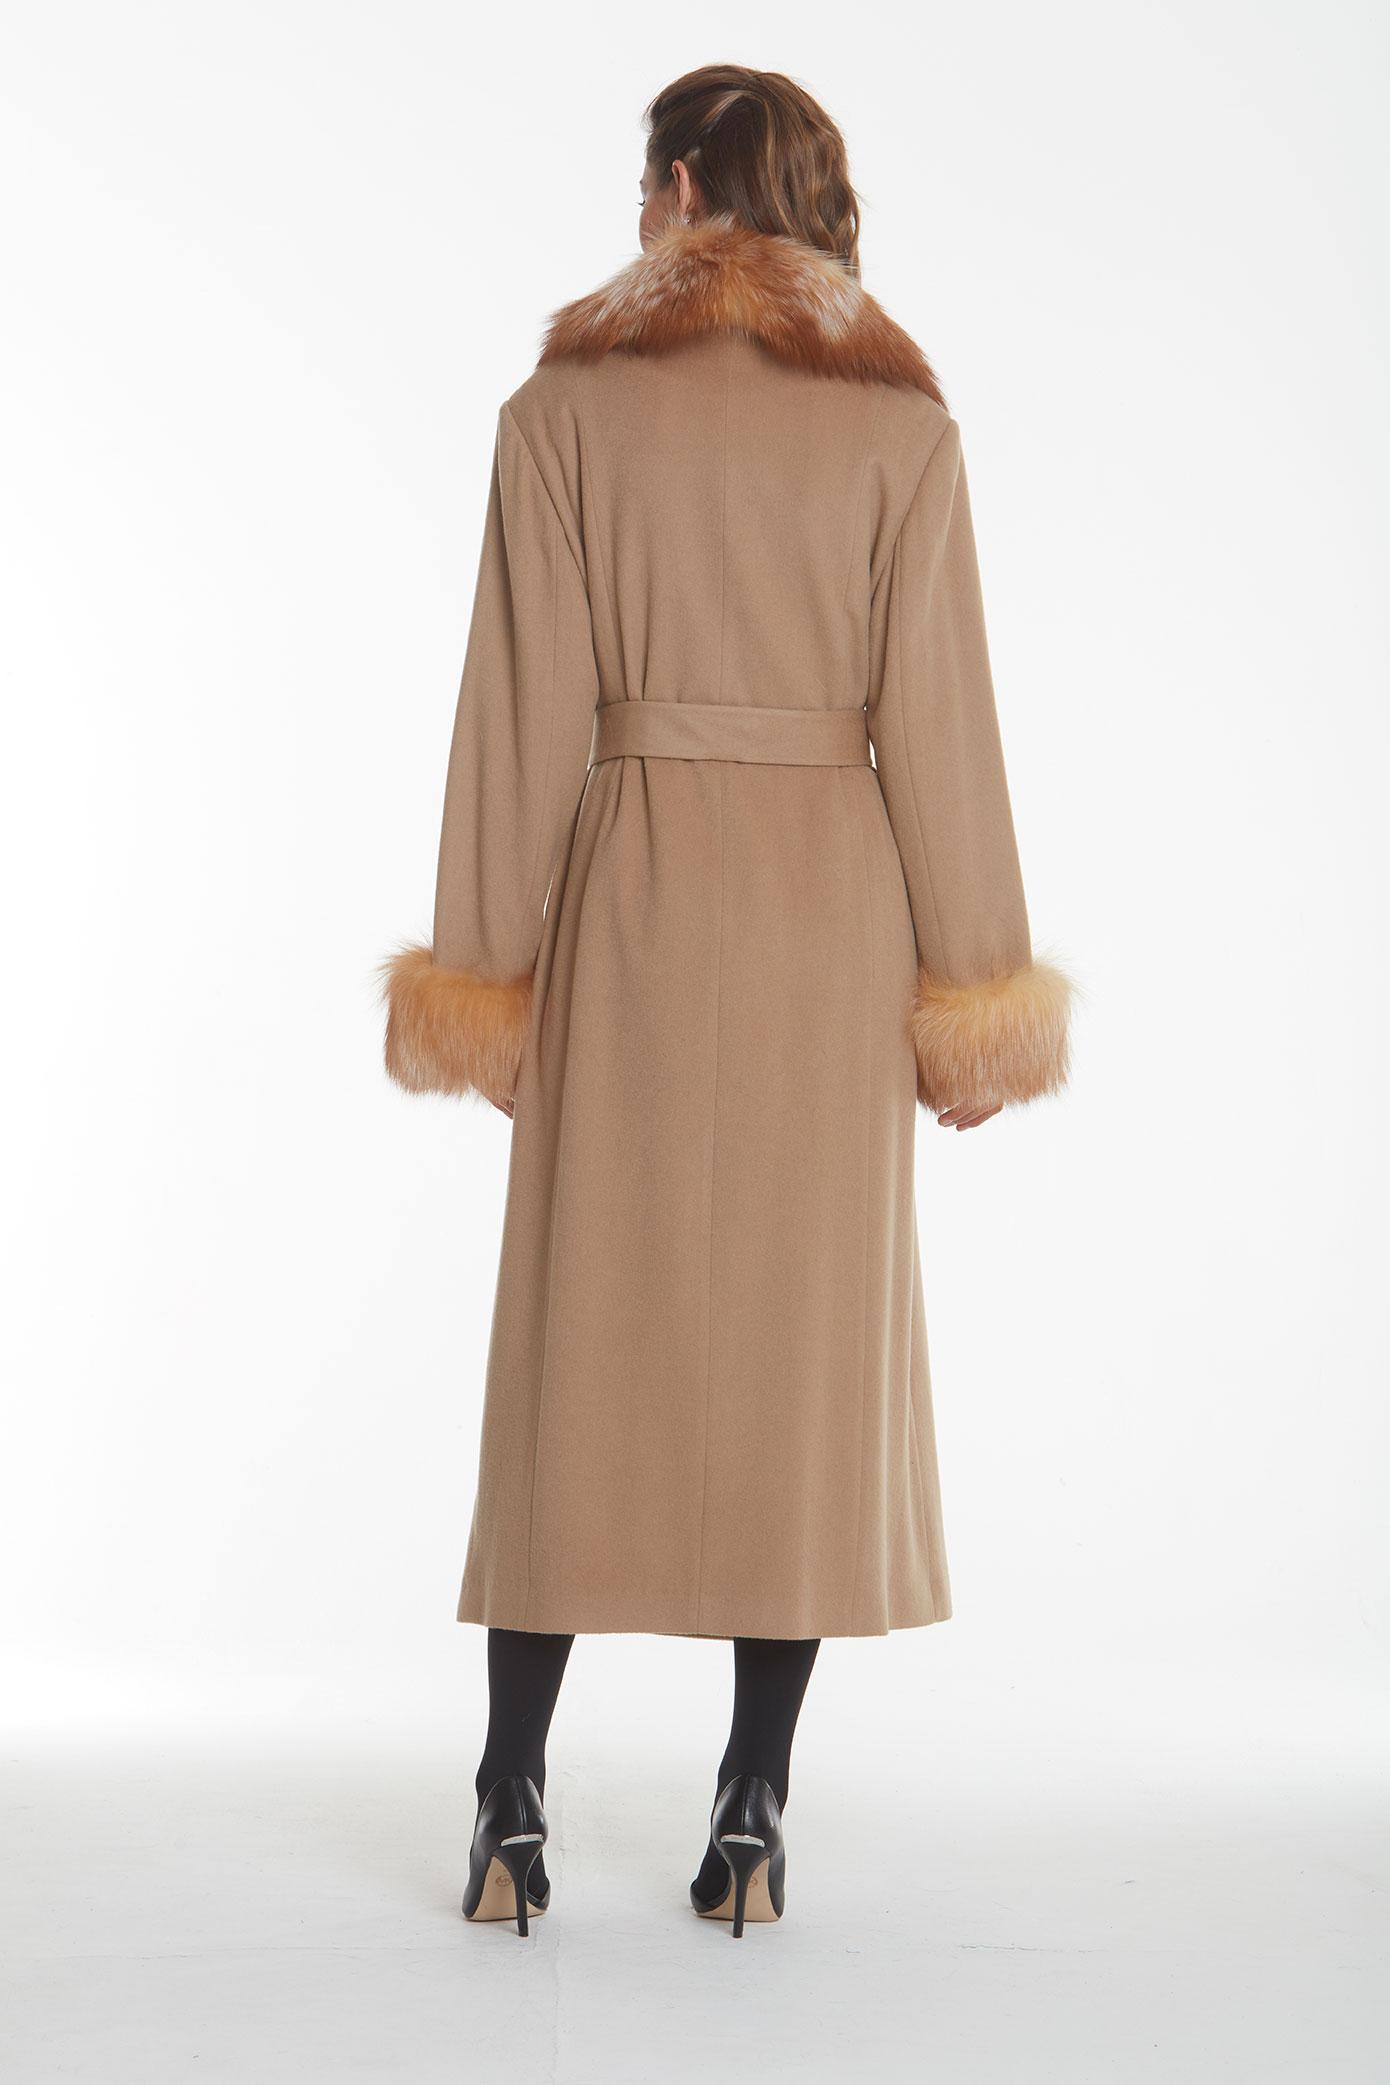 cashmere-camel-coat